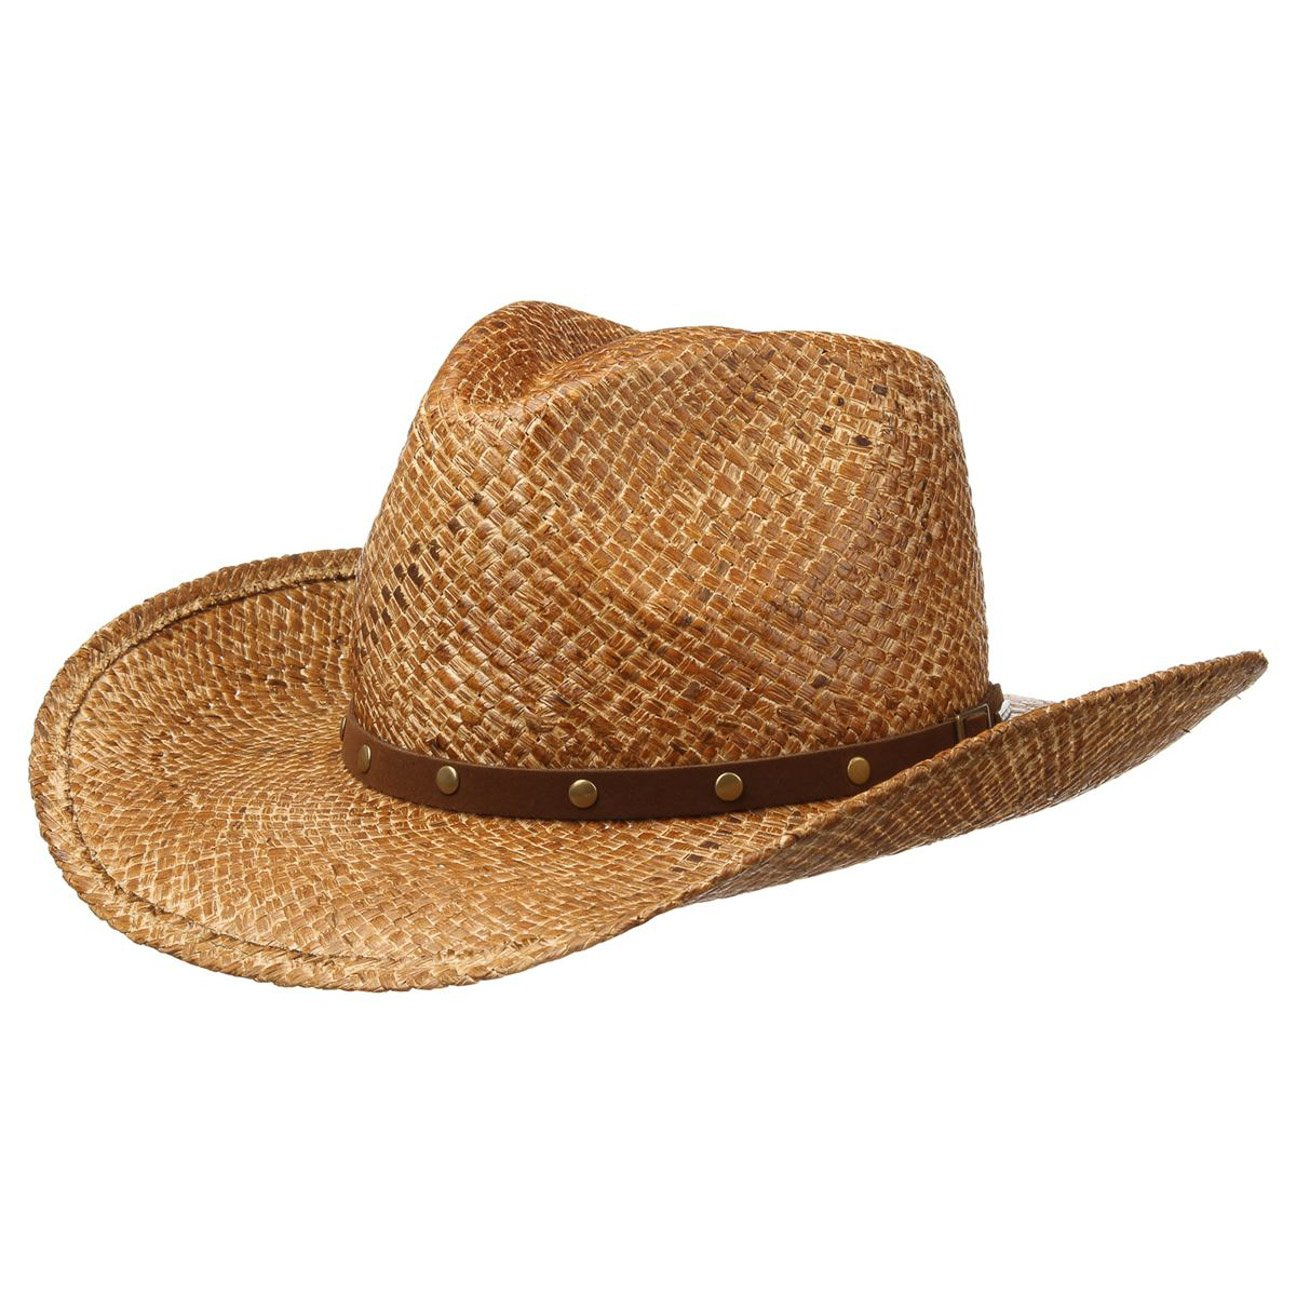 Stetson Hut Sonnenhut Maplewood Raffia Cowboyhut Strohhut Herrenhut mit Lederband